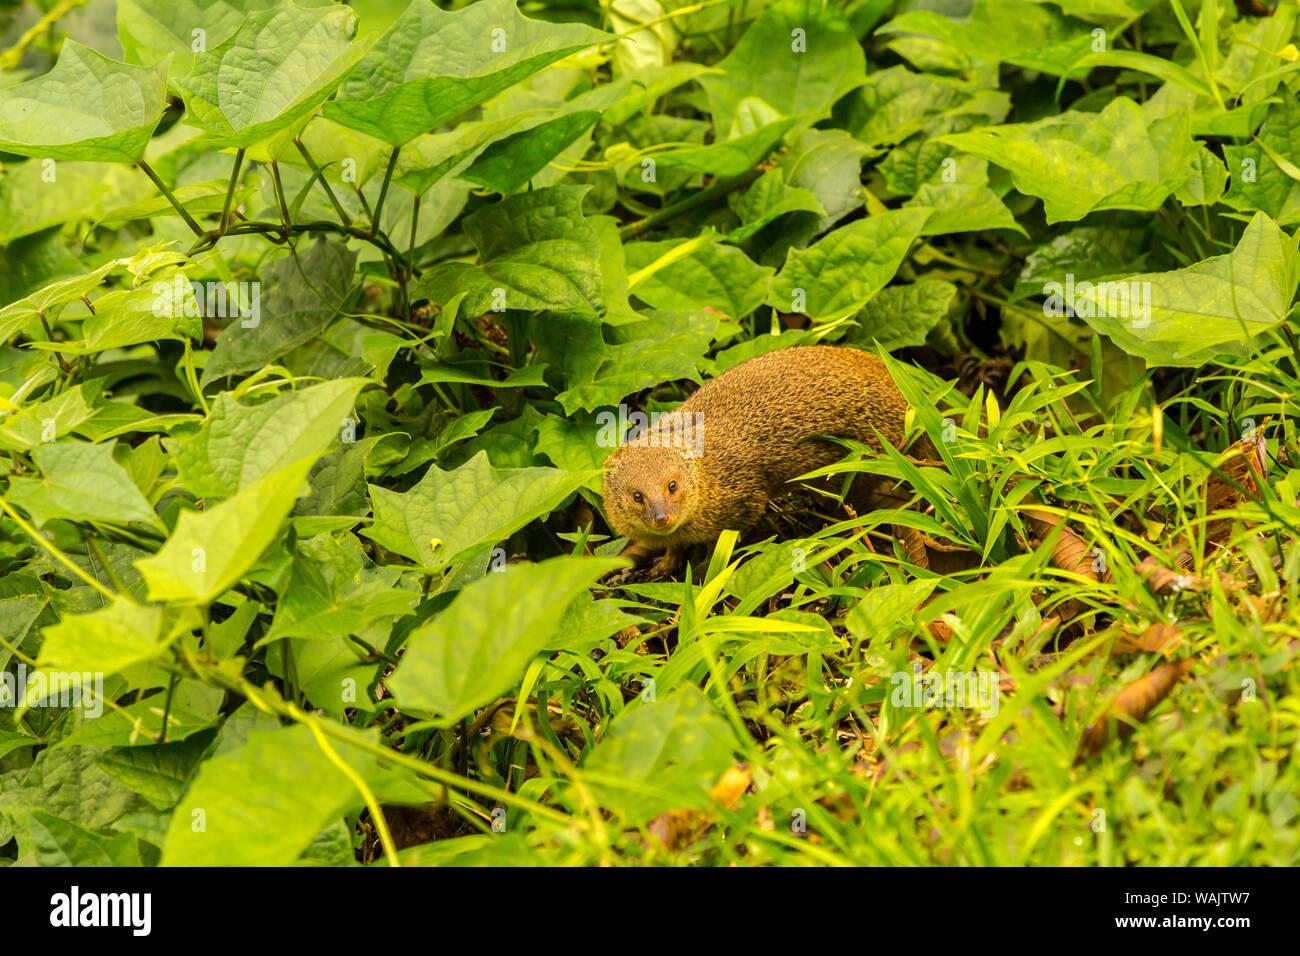 USA, Hawaii, Akaka Falls State Park. Petite mangouste indienne. En tant que crédit: Cathy & Gordon Illg / Jaynes Gallery / DanitaDelimont.com Banque D'Images